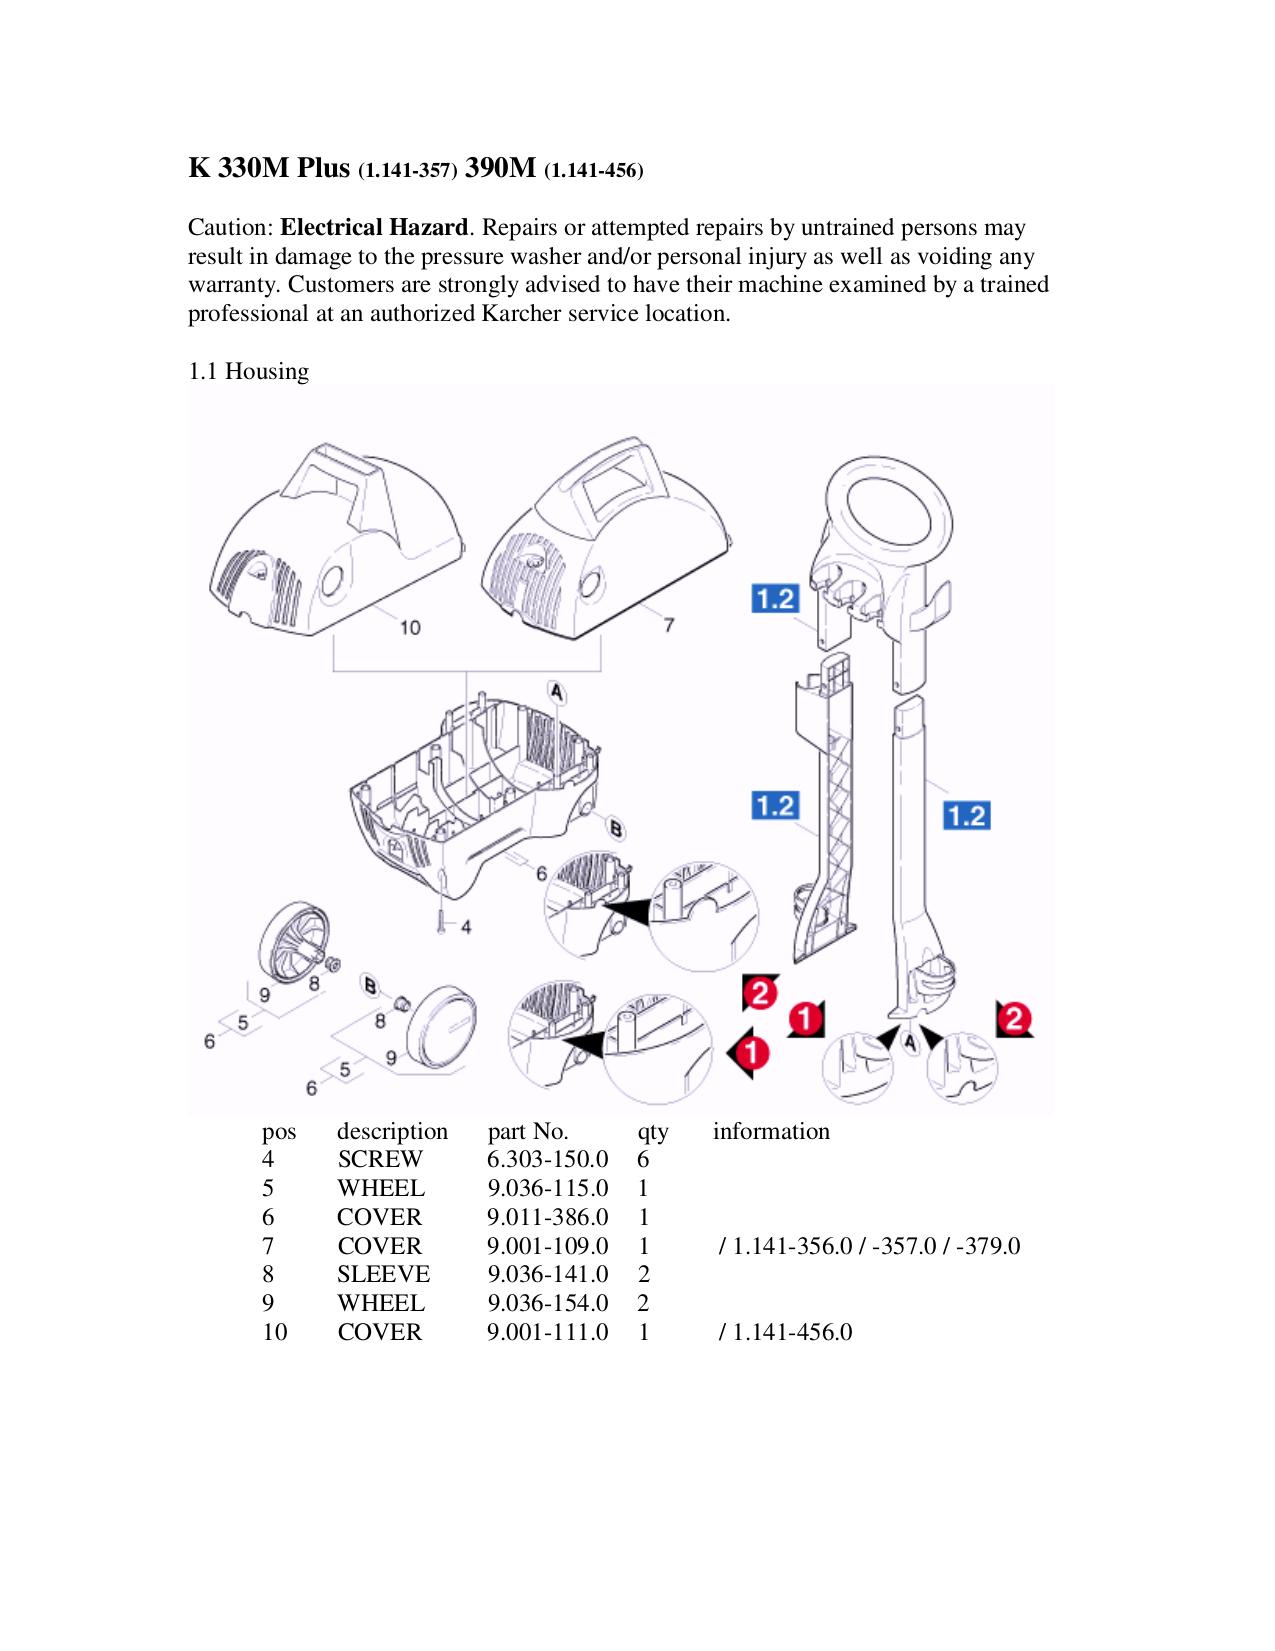 Karcher 390 service manual